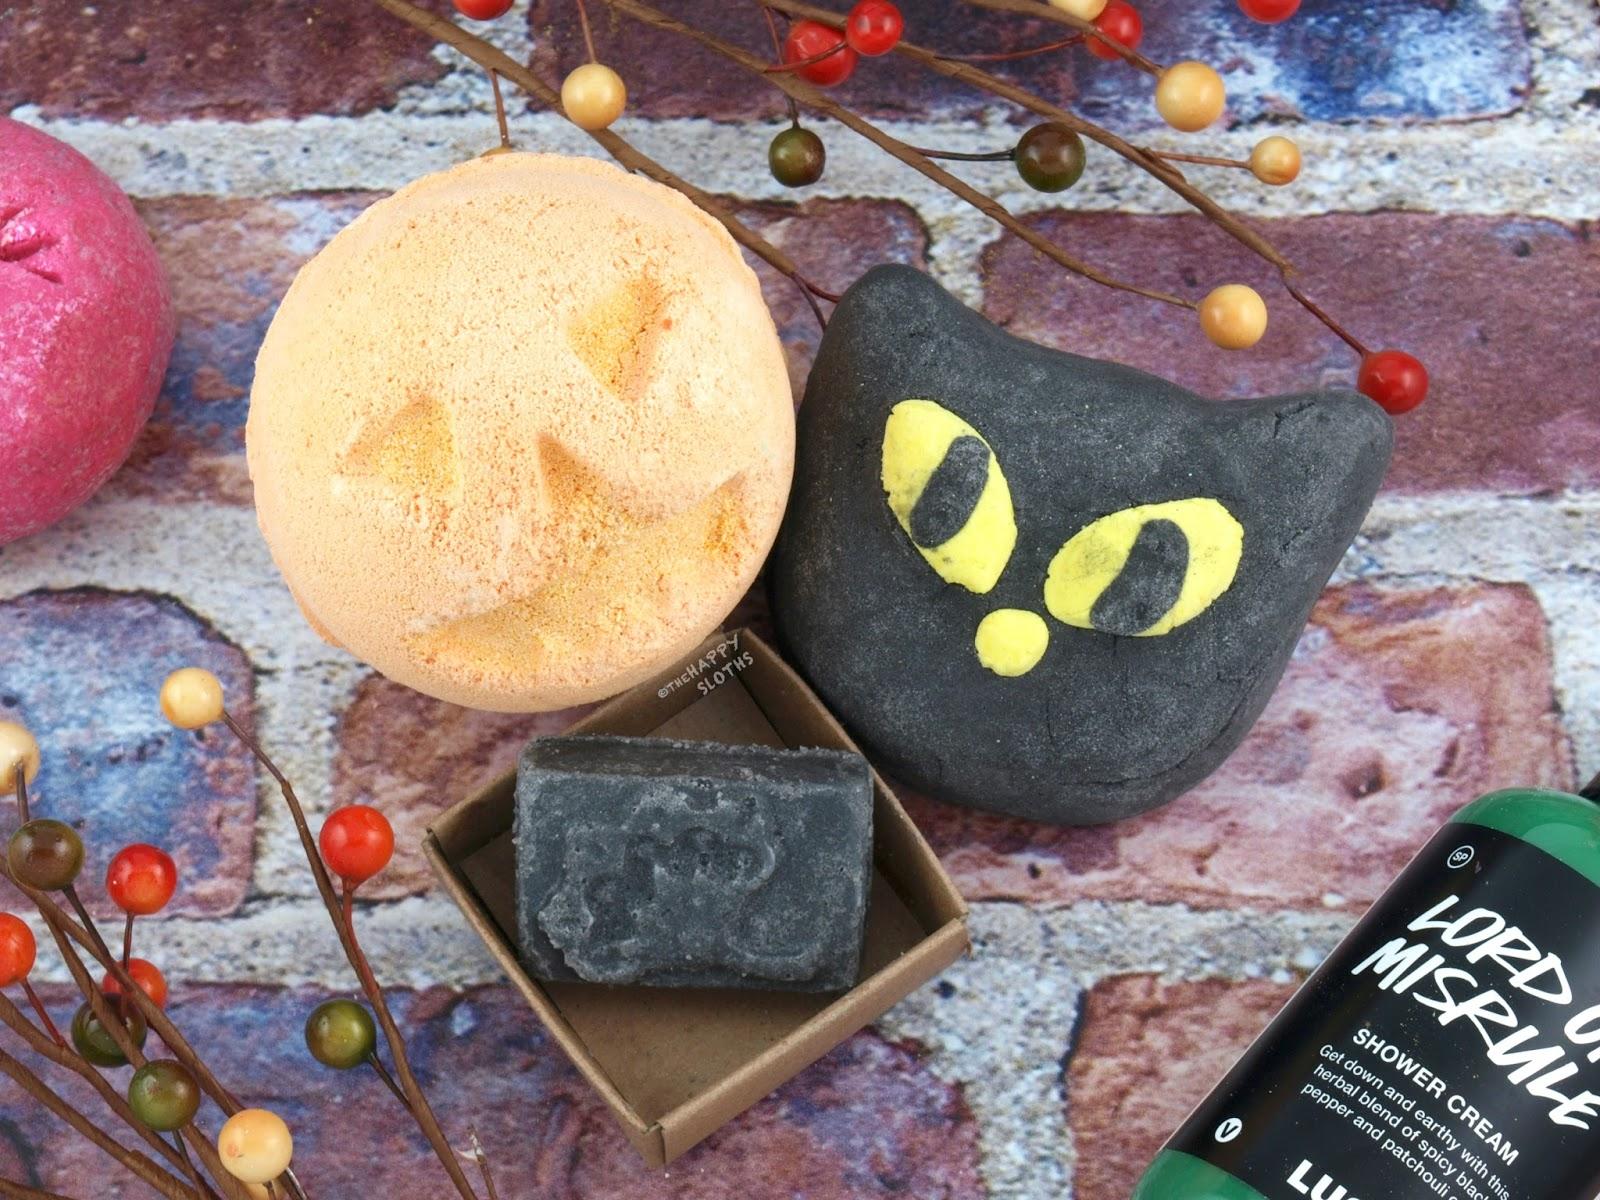 Lush Halloween 2017 Gift Guide: Pumpkin Bath Bomb, Bewitched Bubble Bar & Black Rose Naked Lip Scrub